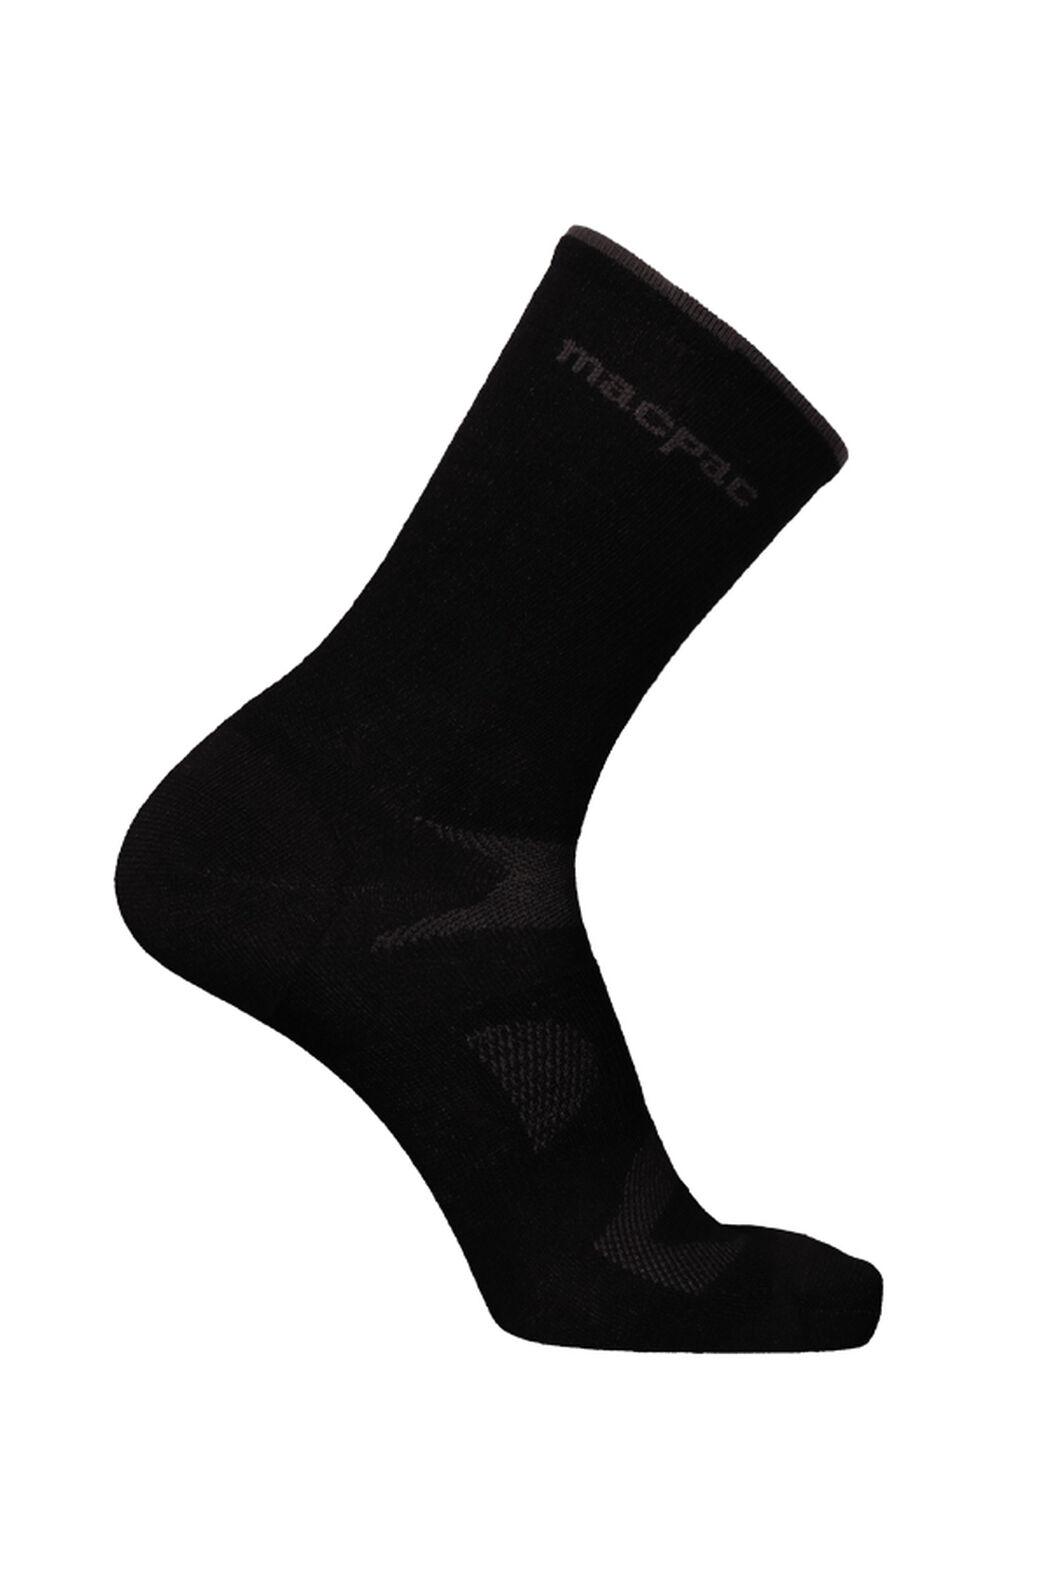 Macpac Merino Rouleur Crew Socks V2, Black, hi-res